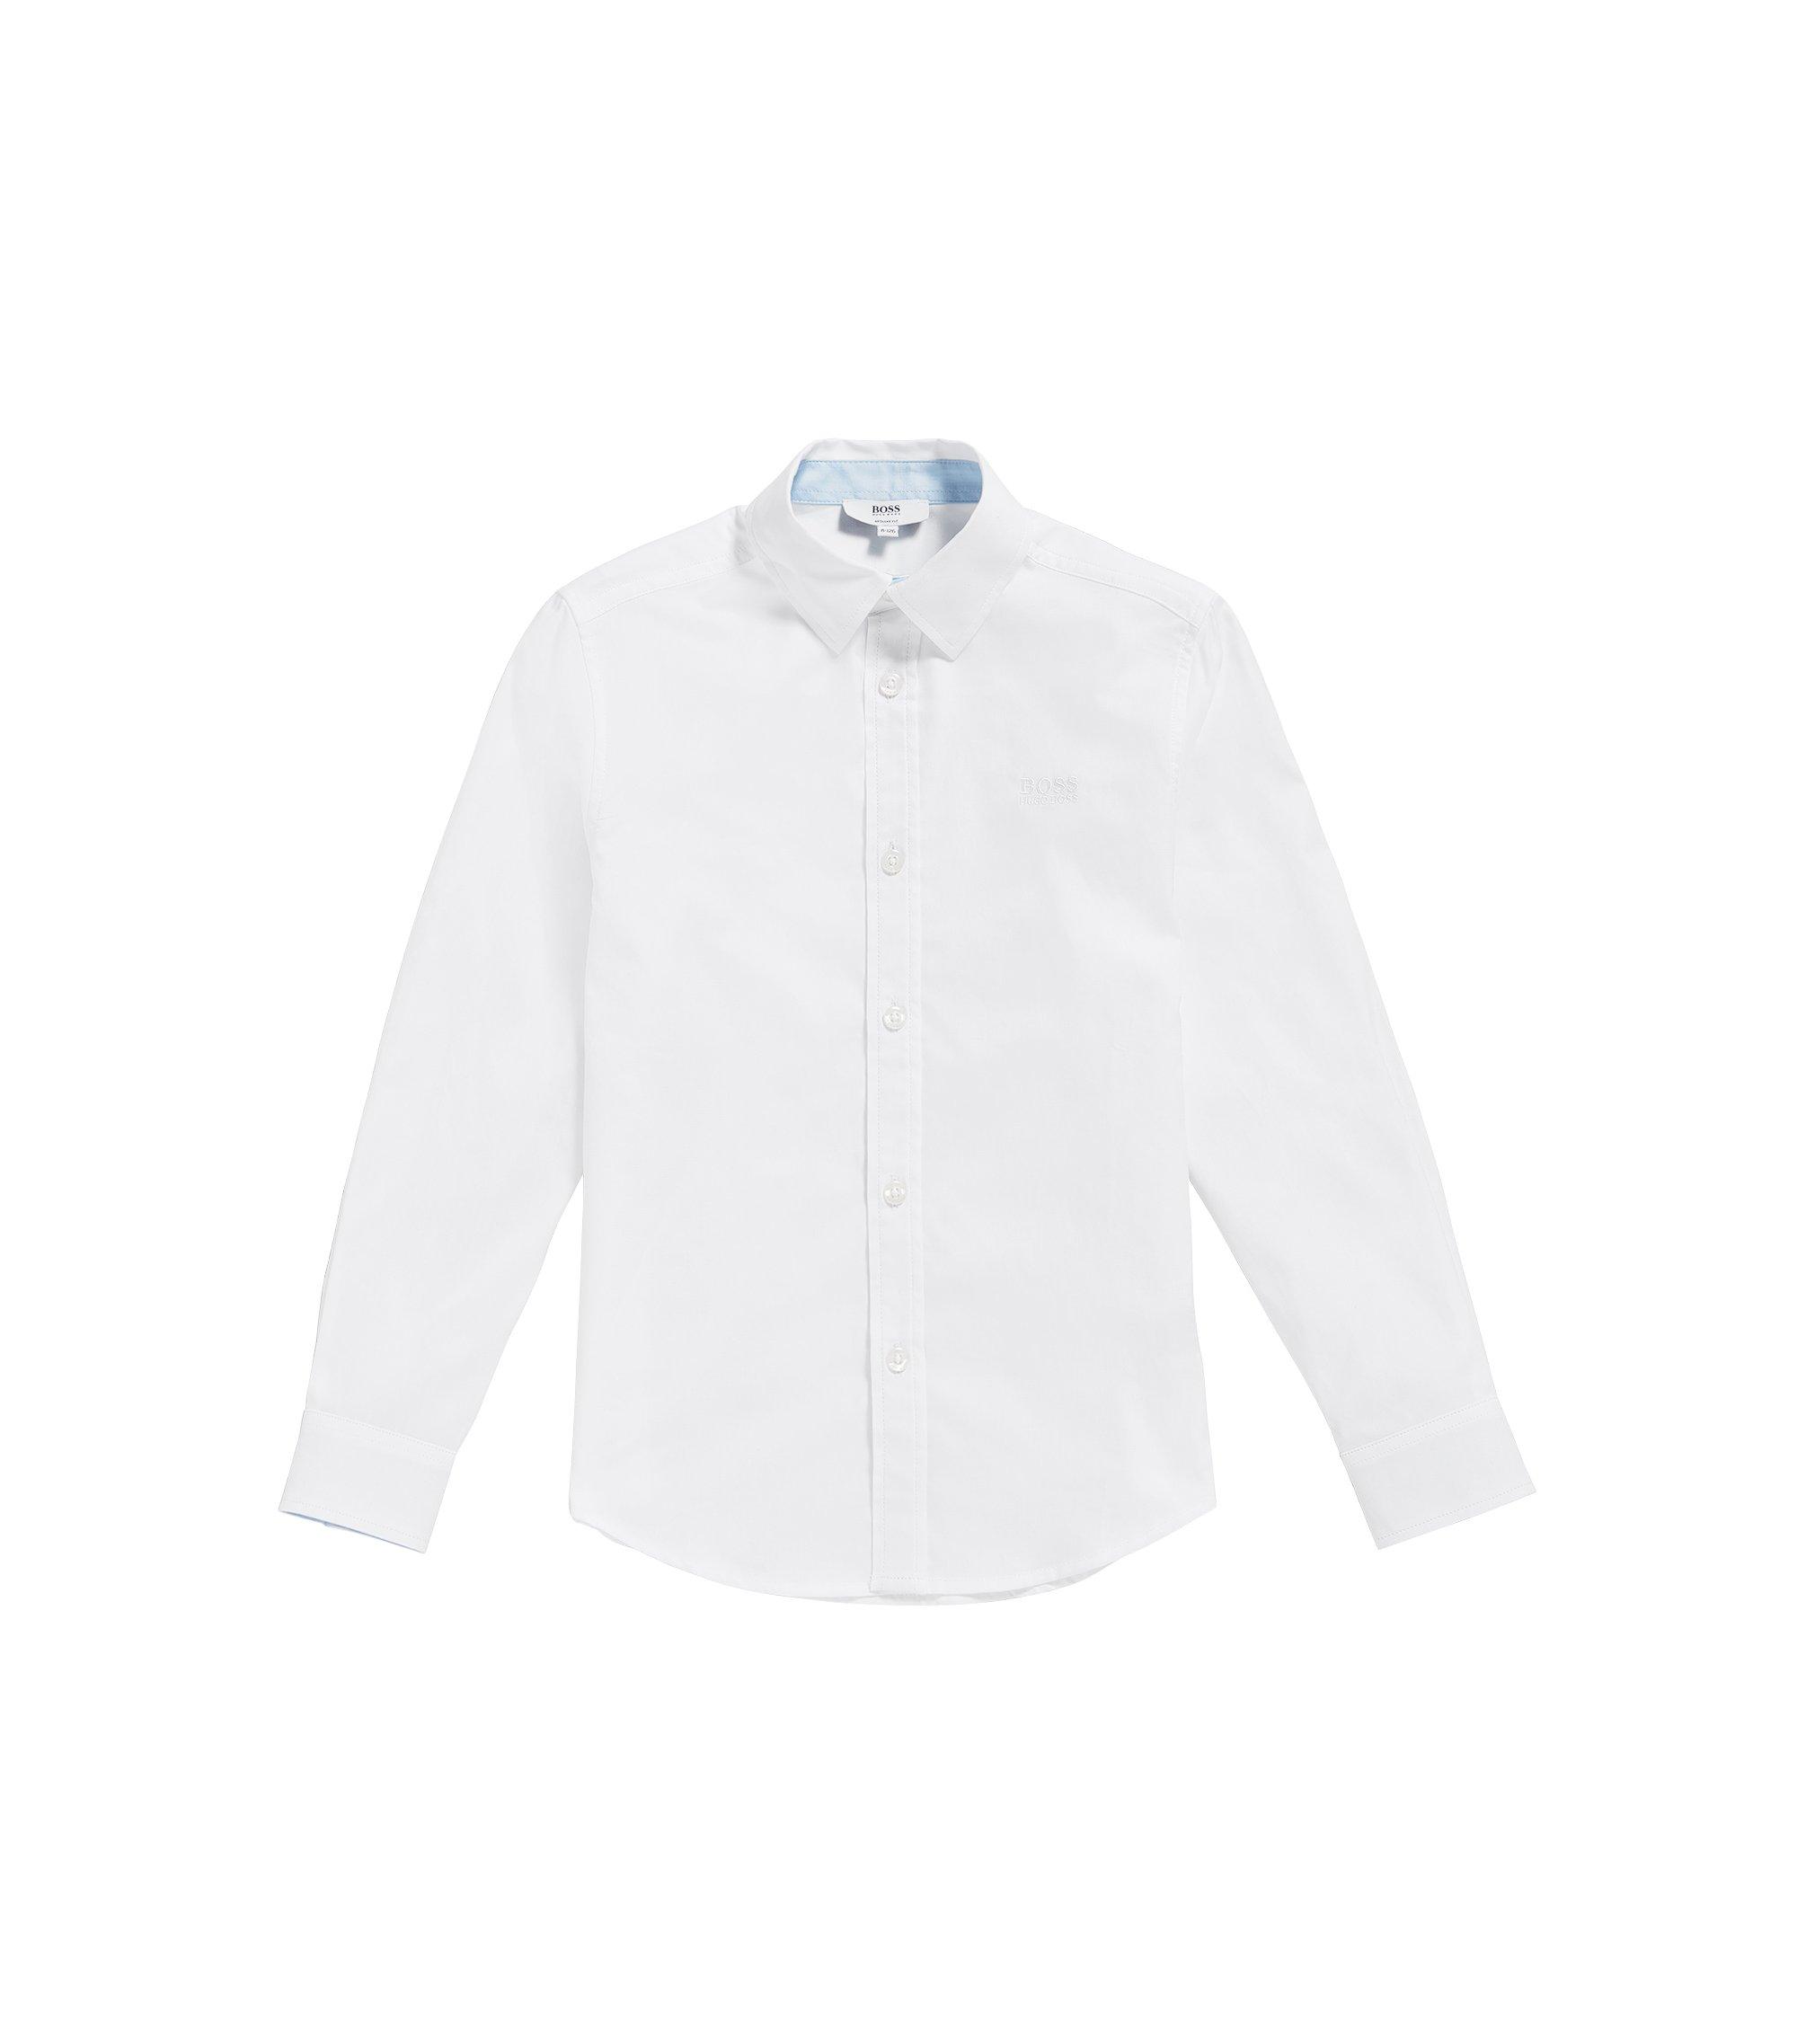 Camisa regular fit en algodón fil a fil para niños, Blanco